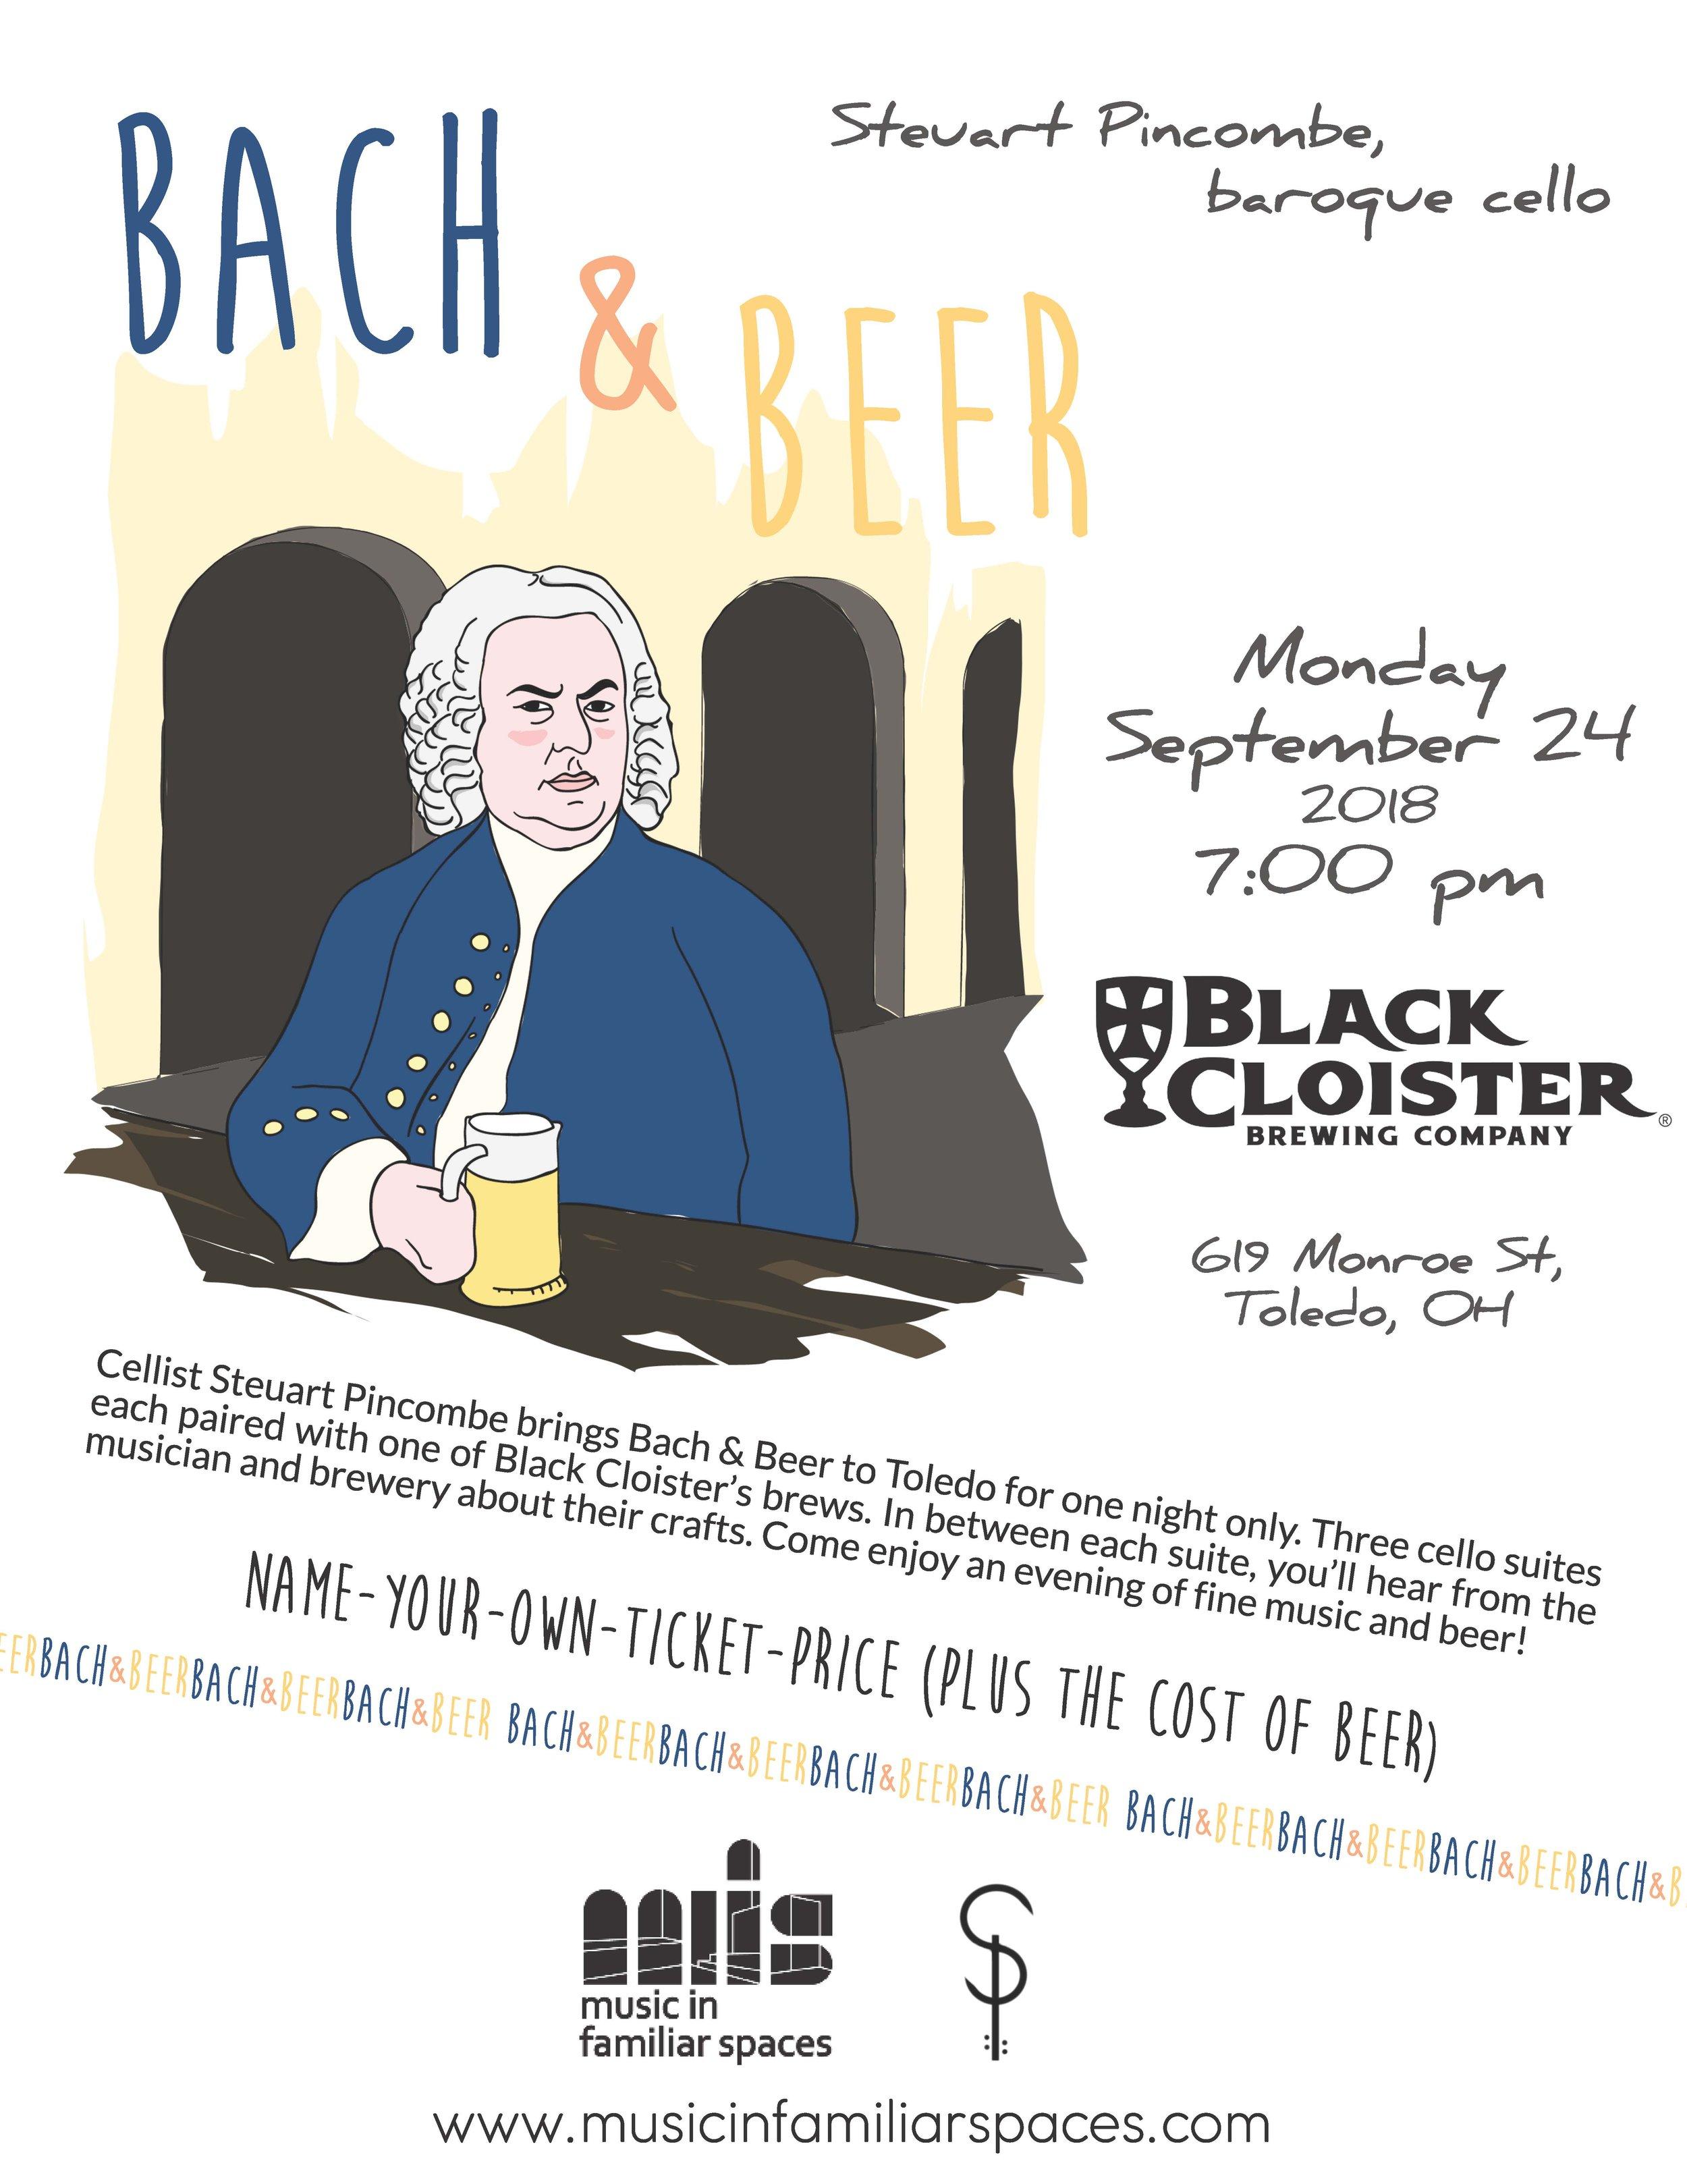 ToledoOH_BlackCloister_Bach&Beer.jpg